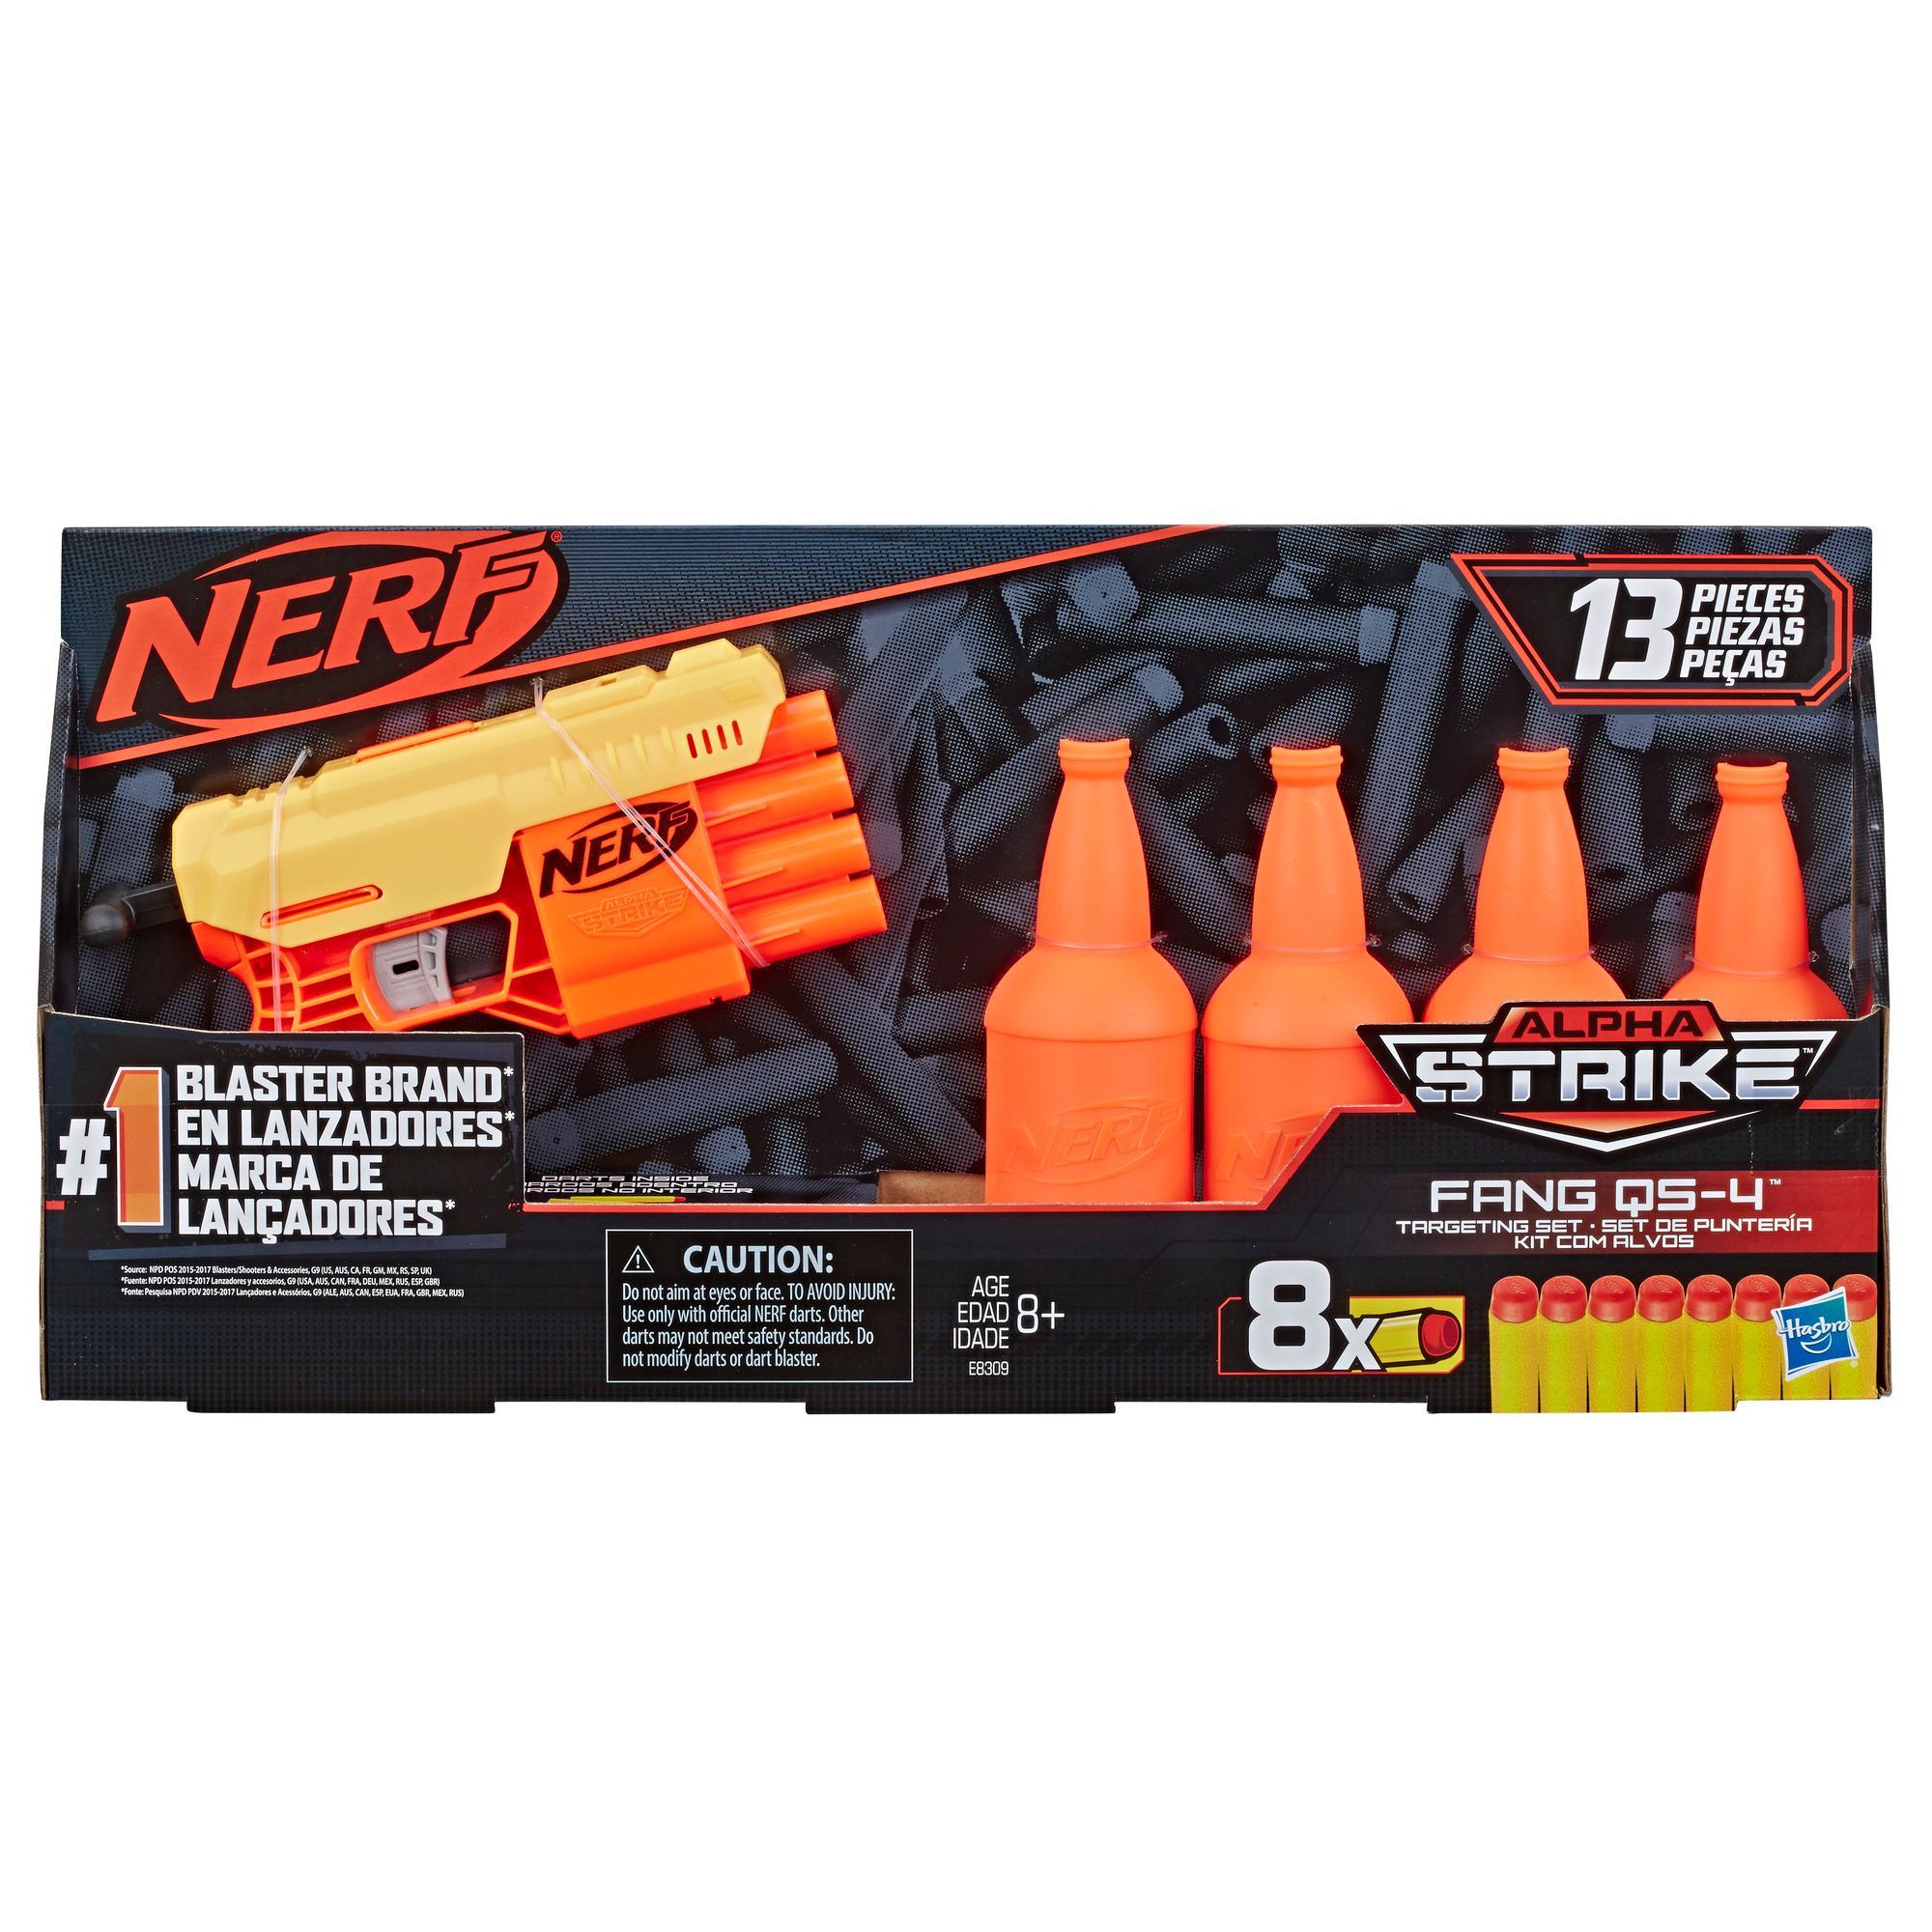 Kit de Treino Fang QS-4: O kit de 13 peças Nerf Alpha Strike